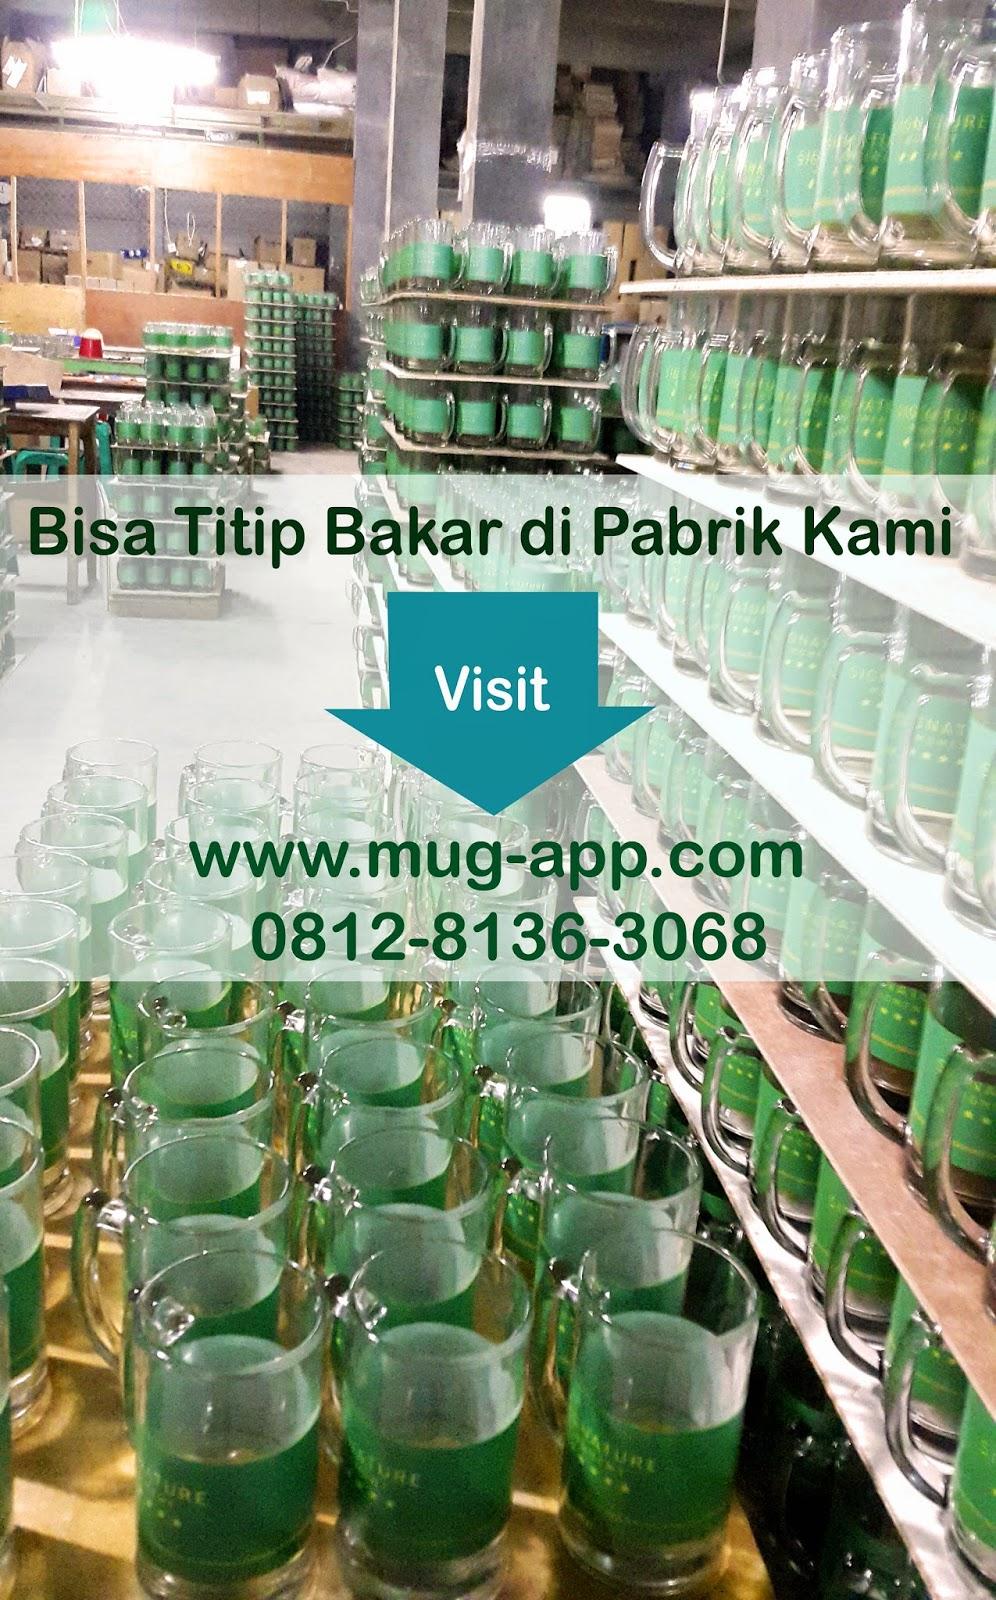 Jasa Titip bakar Mug Keramik